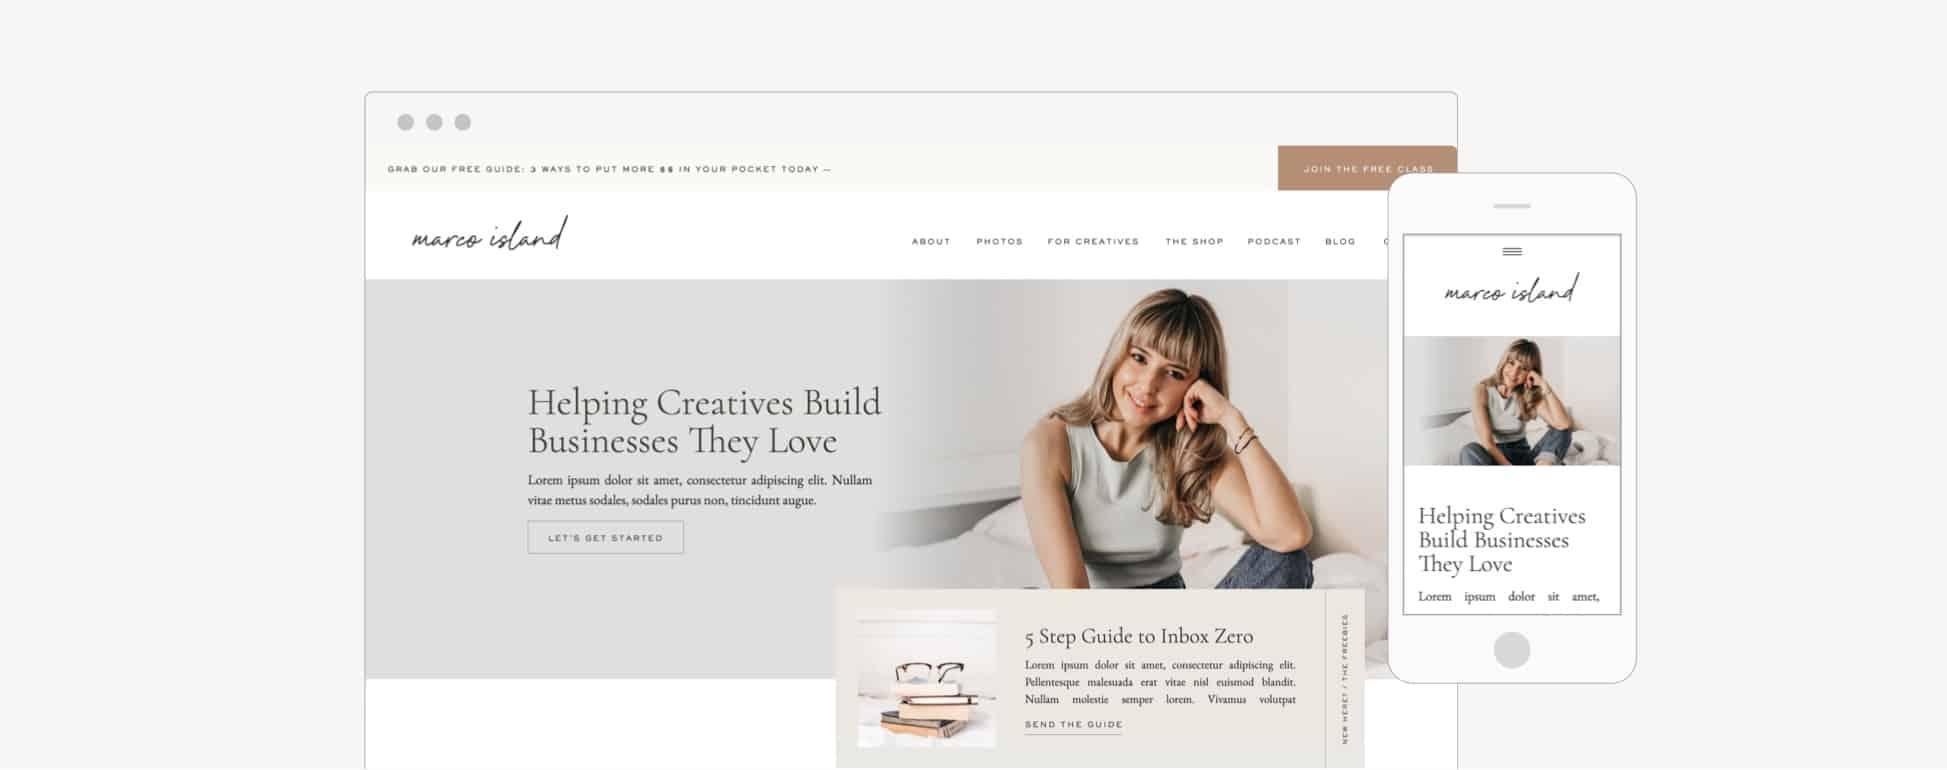 Product Header Copymarco-island